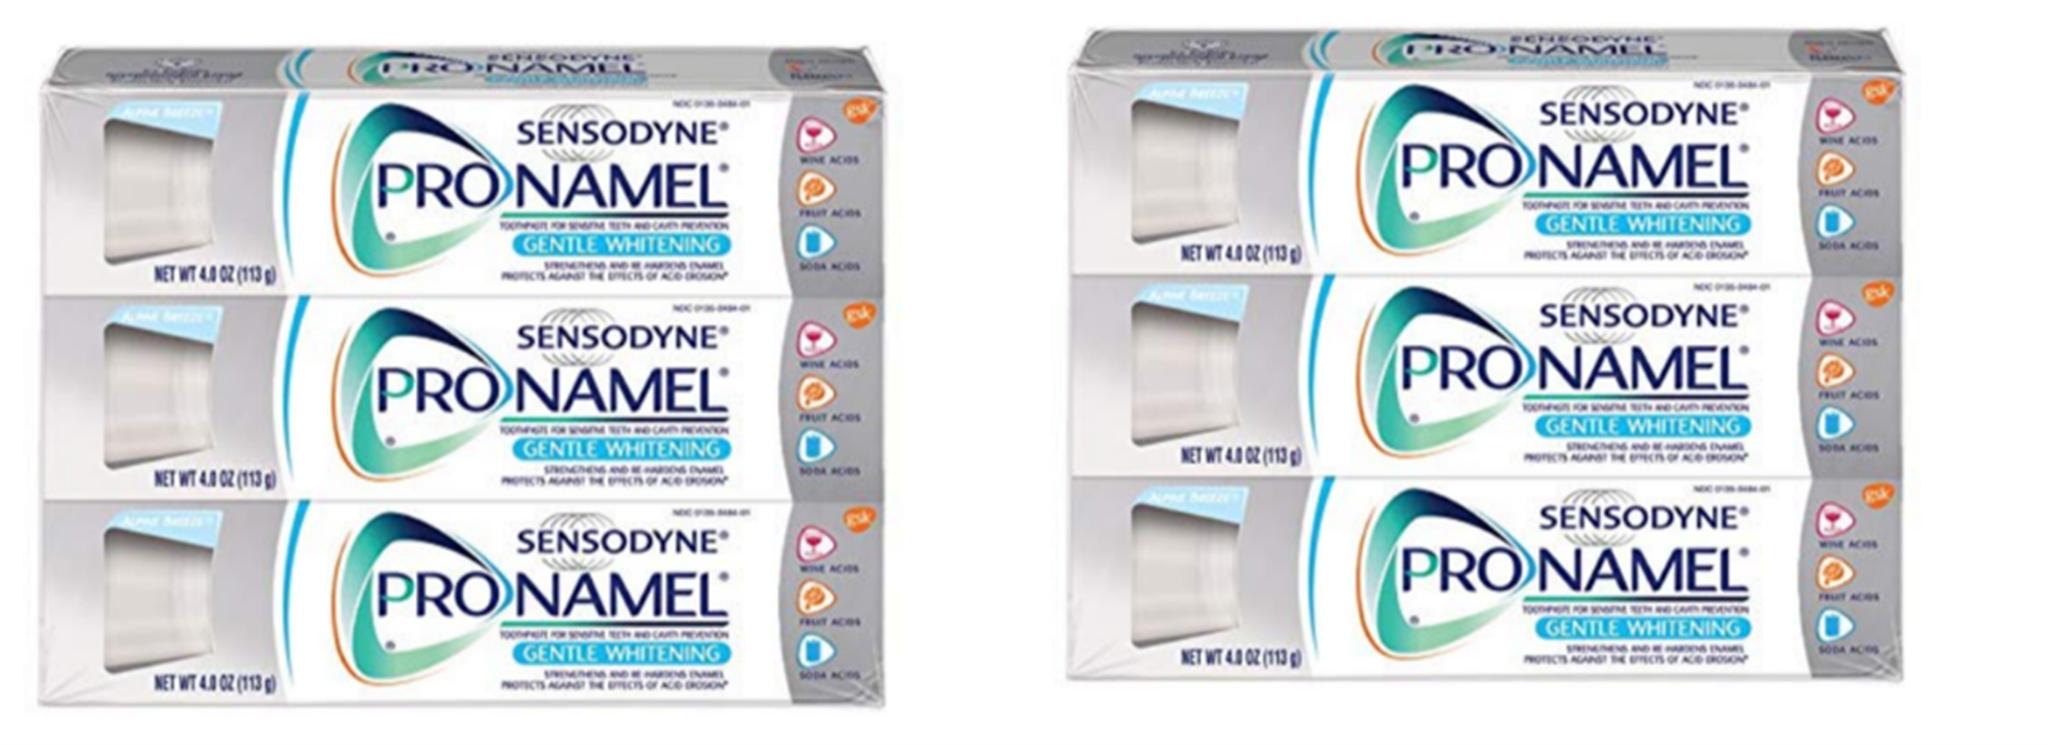 Amazon – 6 Pack Of Sensodyne Pronamel Gentle Whitening, Sensitive Toothpaste (4 oz) Only $20.72 + Free Shipping!